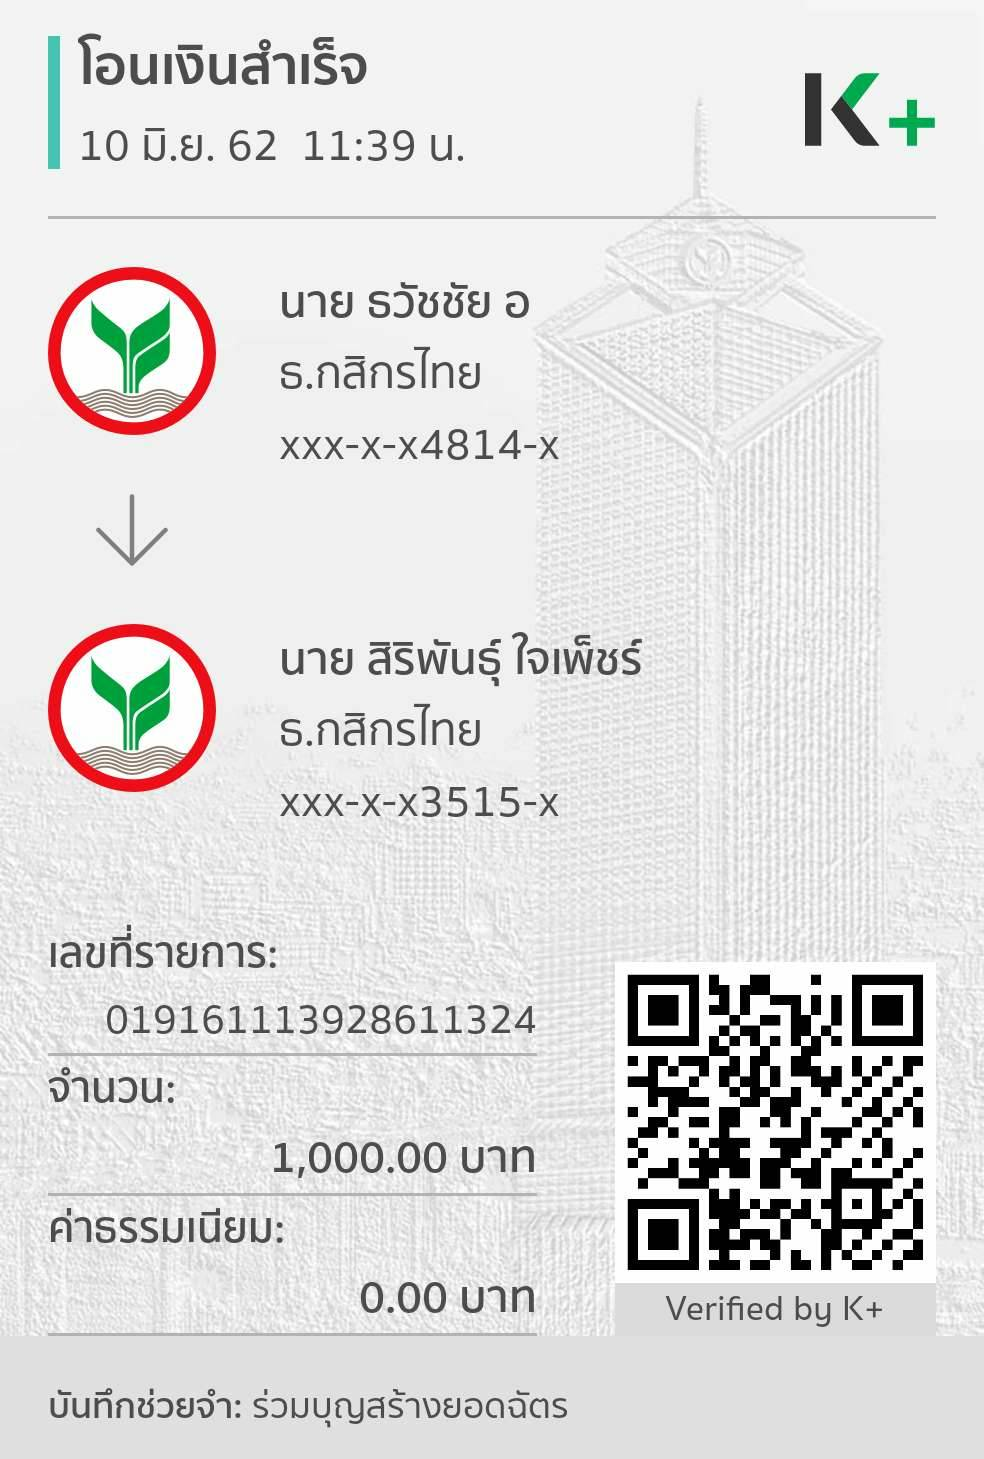 ?temp_hash=56fc0aba445c73d6d1c5602adf9d4c8f.jpg